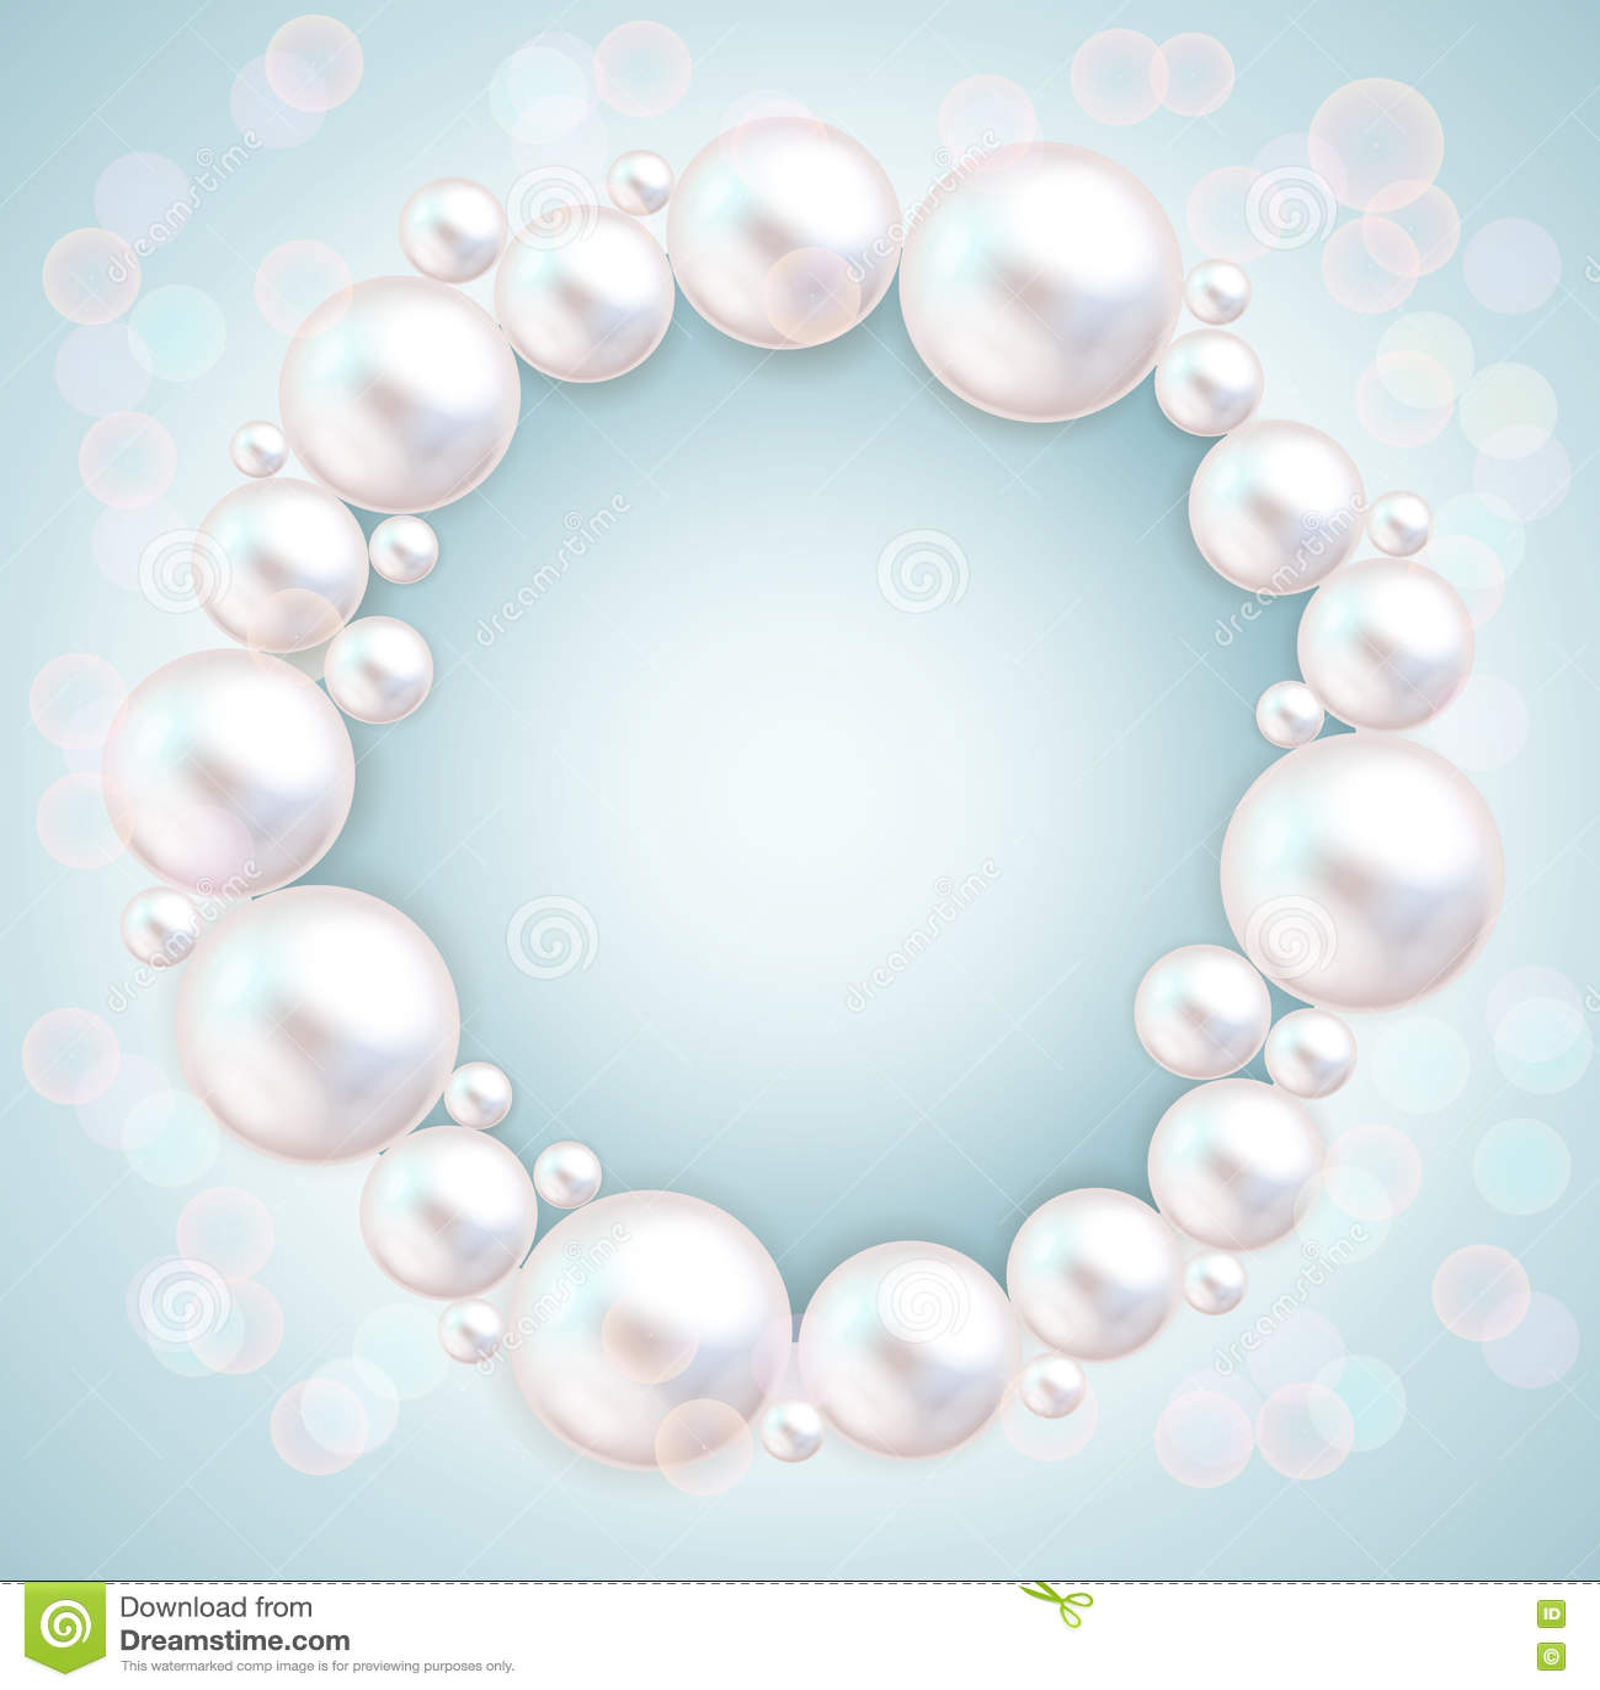 Pearl Beads Wedding Invitation Frame On Blue Background. Jewellery ...